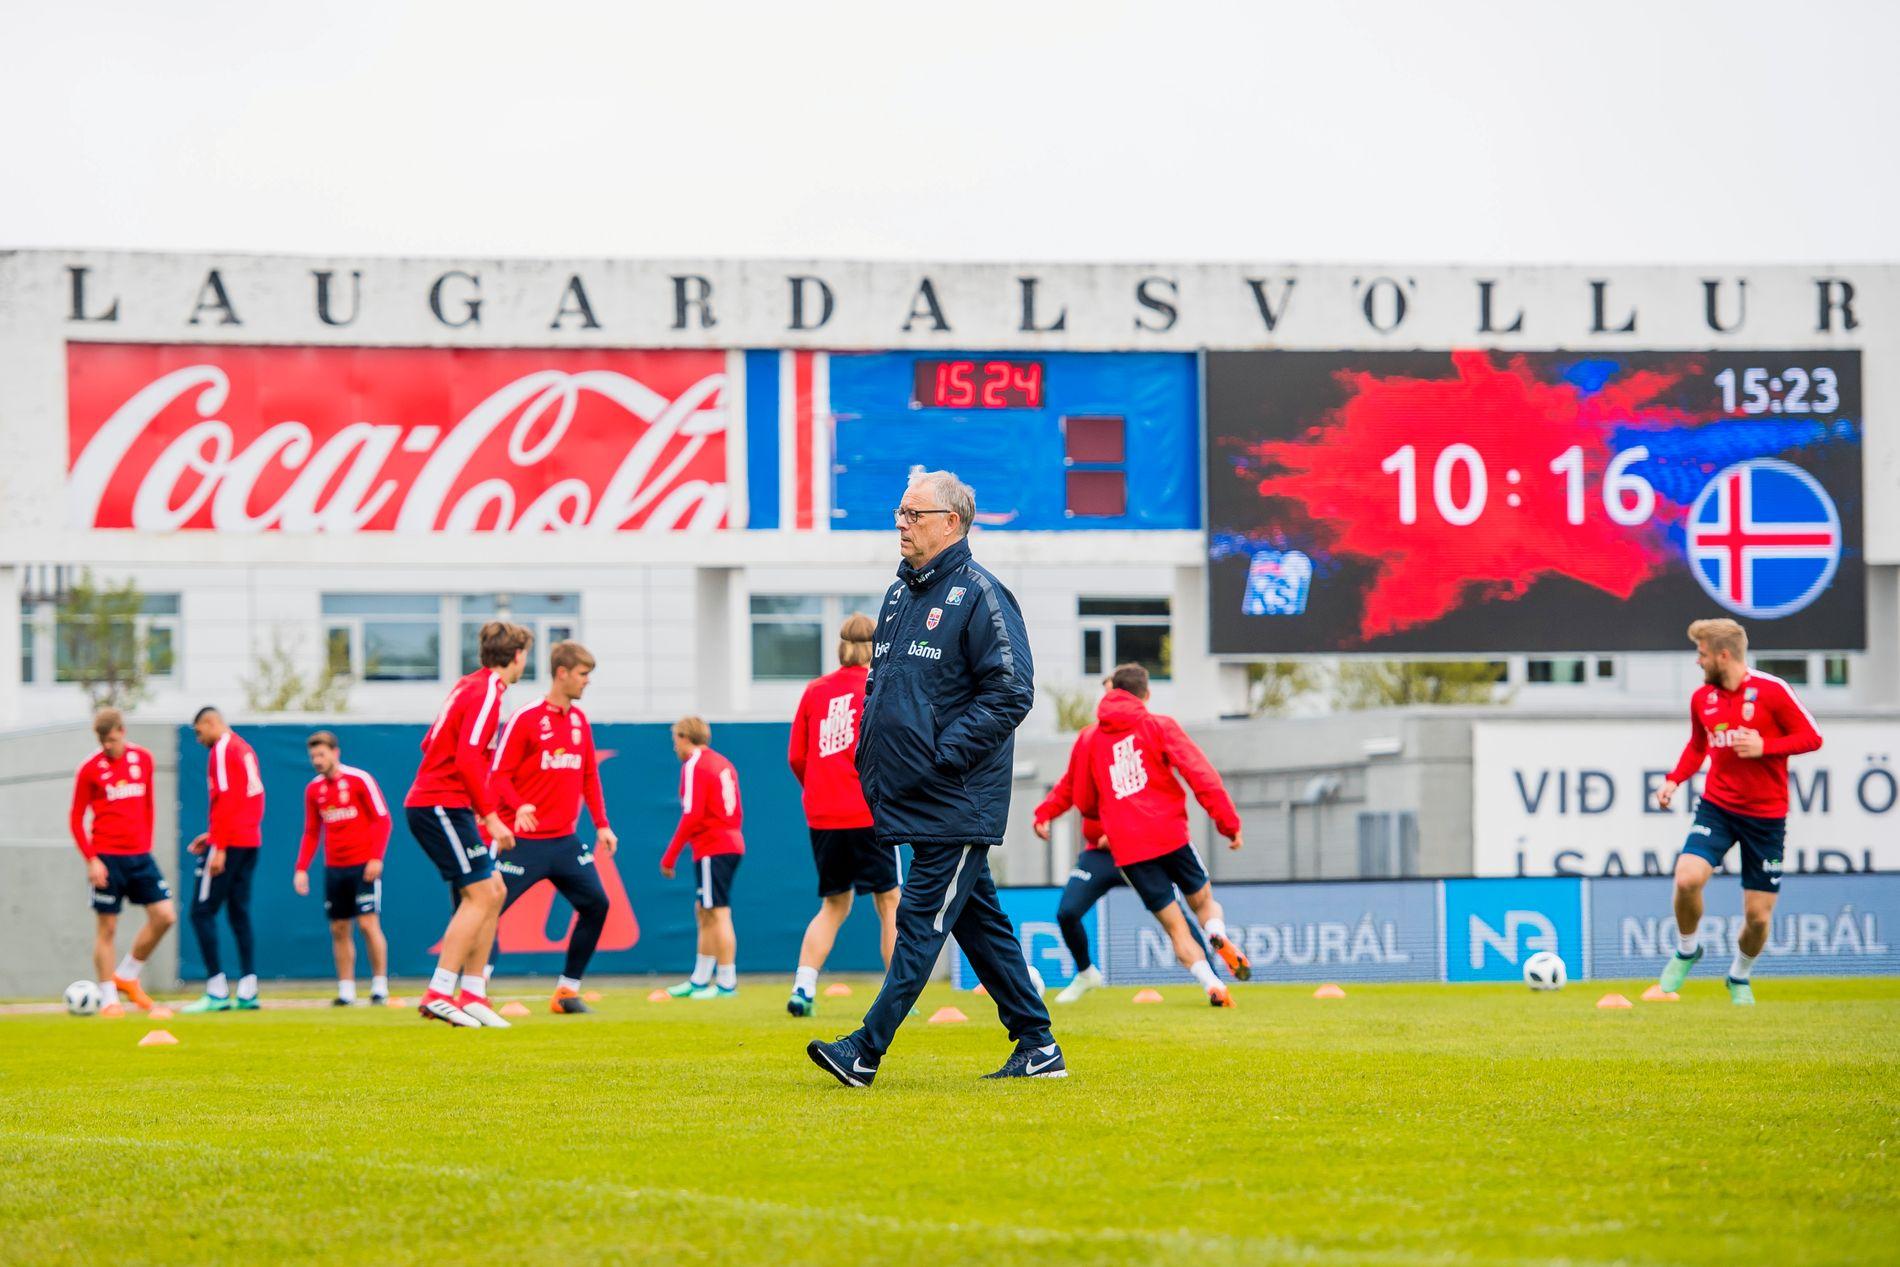 PÅ KJENT GRESS: Lars Lagerbäck er klar for å møte de islandske landslagsspillerne igjen, men denne gang som landslagssjef for Norge. I går trente spillerne på nasjonalarenaen Laugardalsvölluer i hovedstaden Reykjavik.